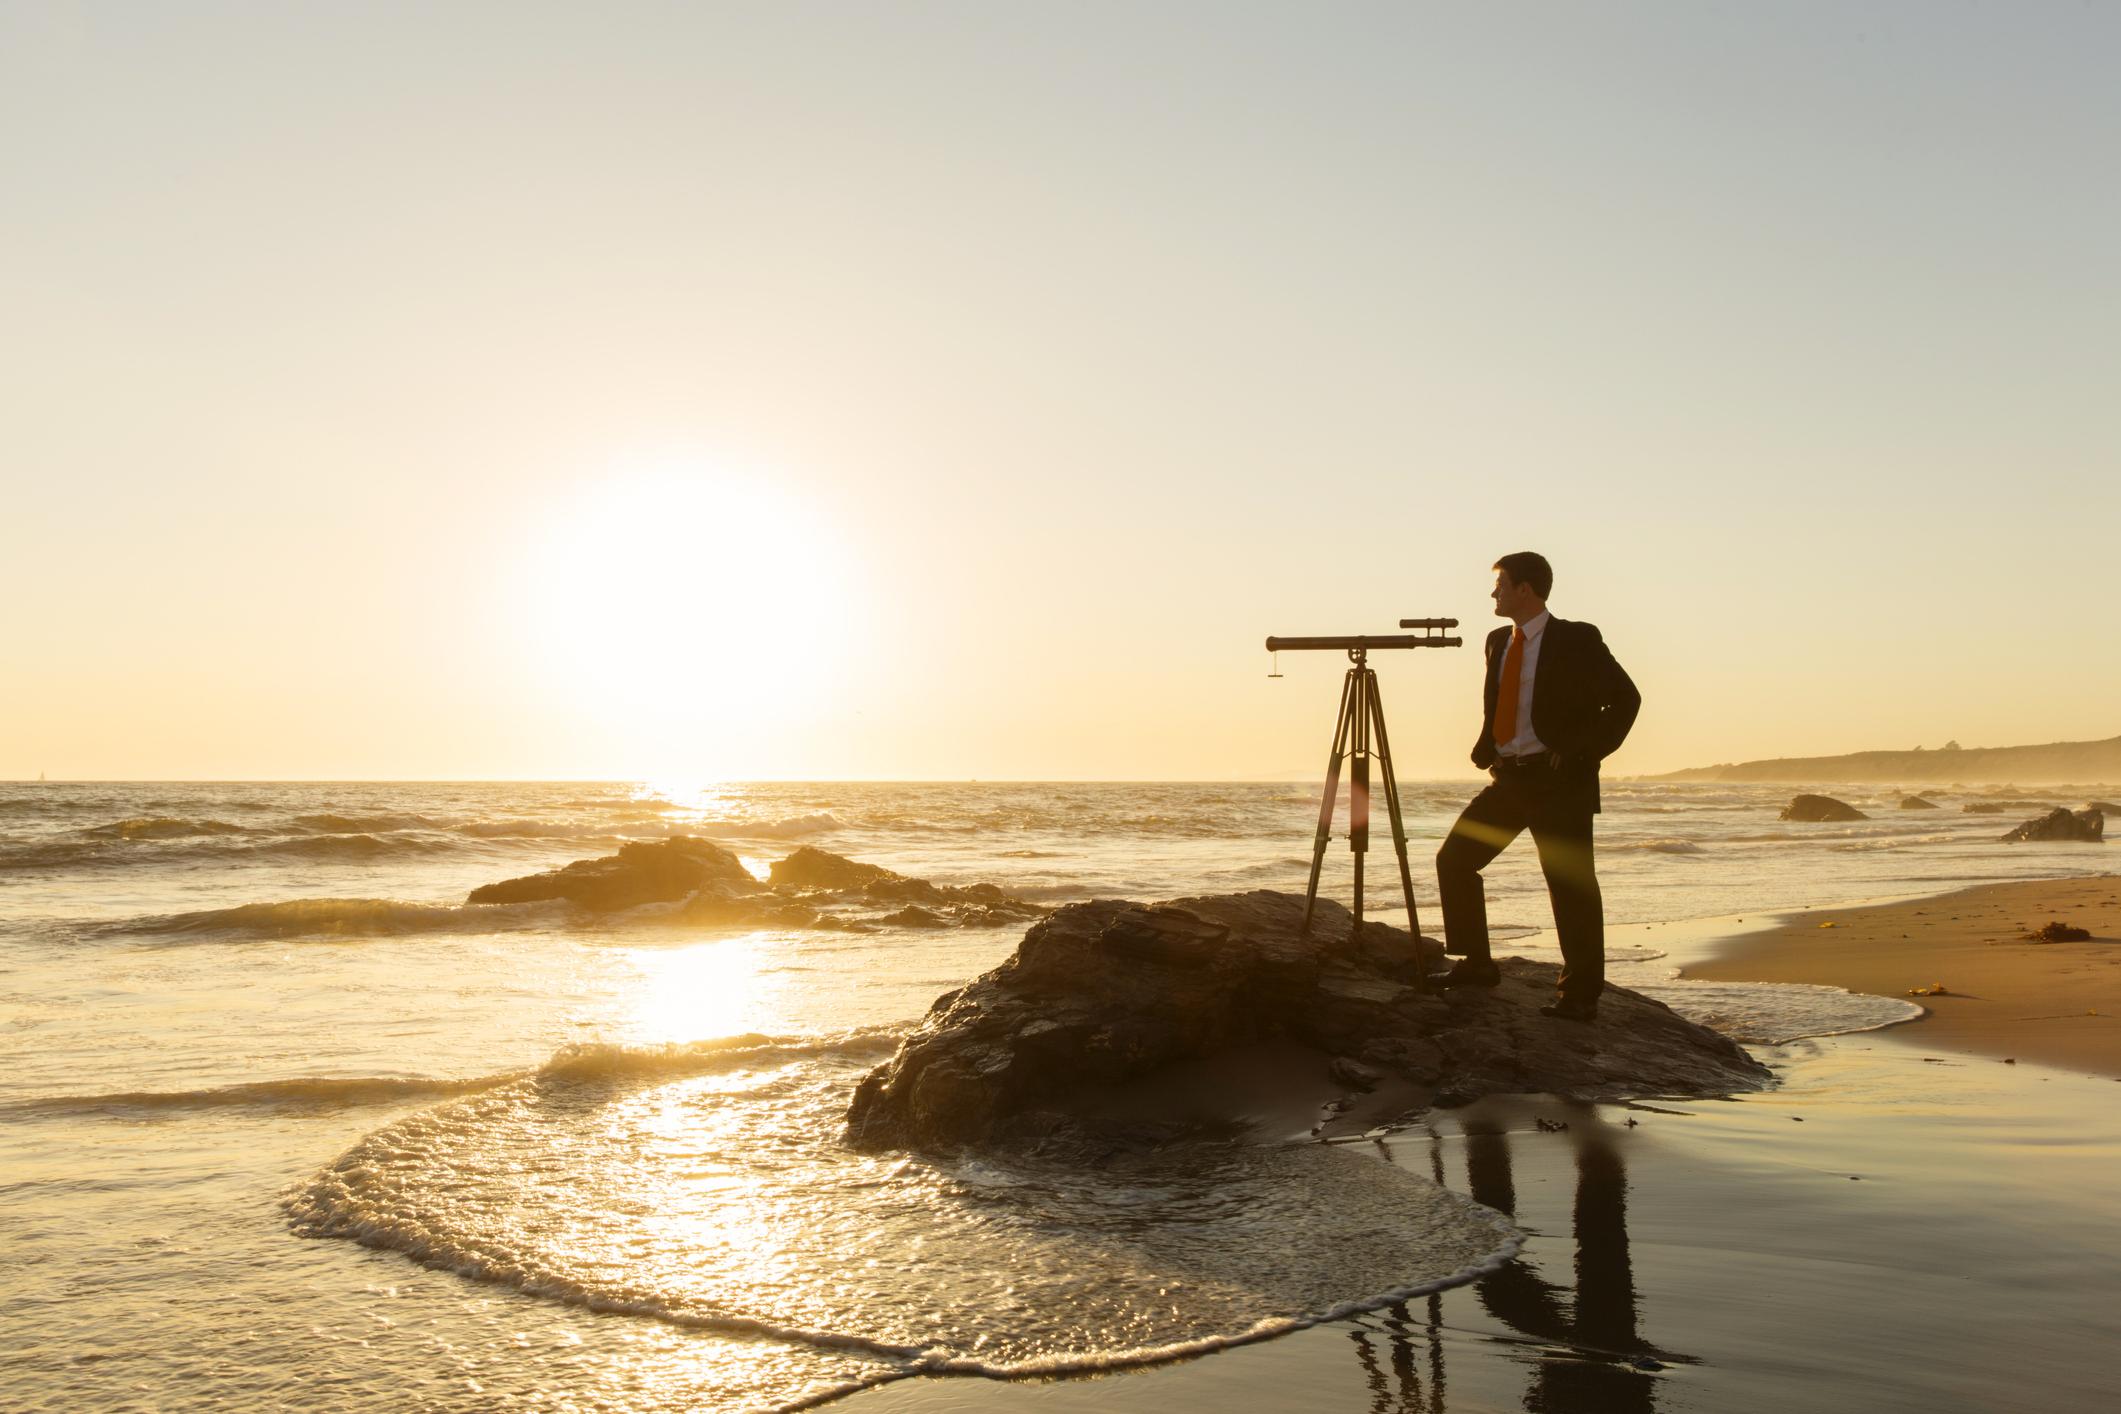 Businessman with Telescope on California Beach